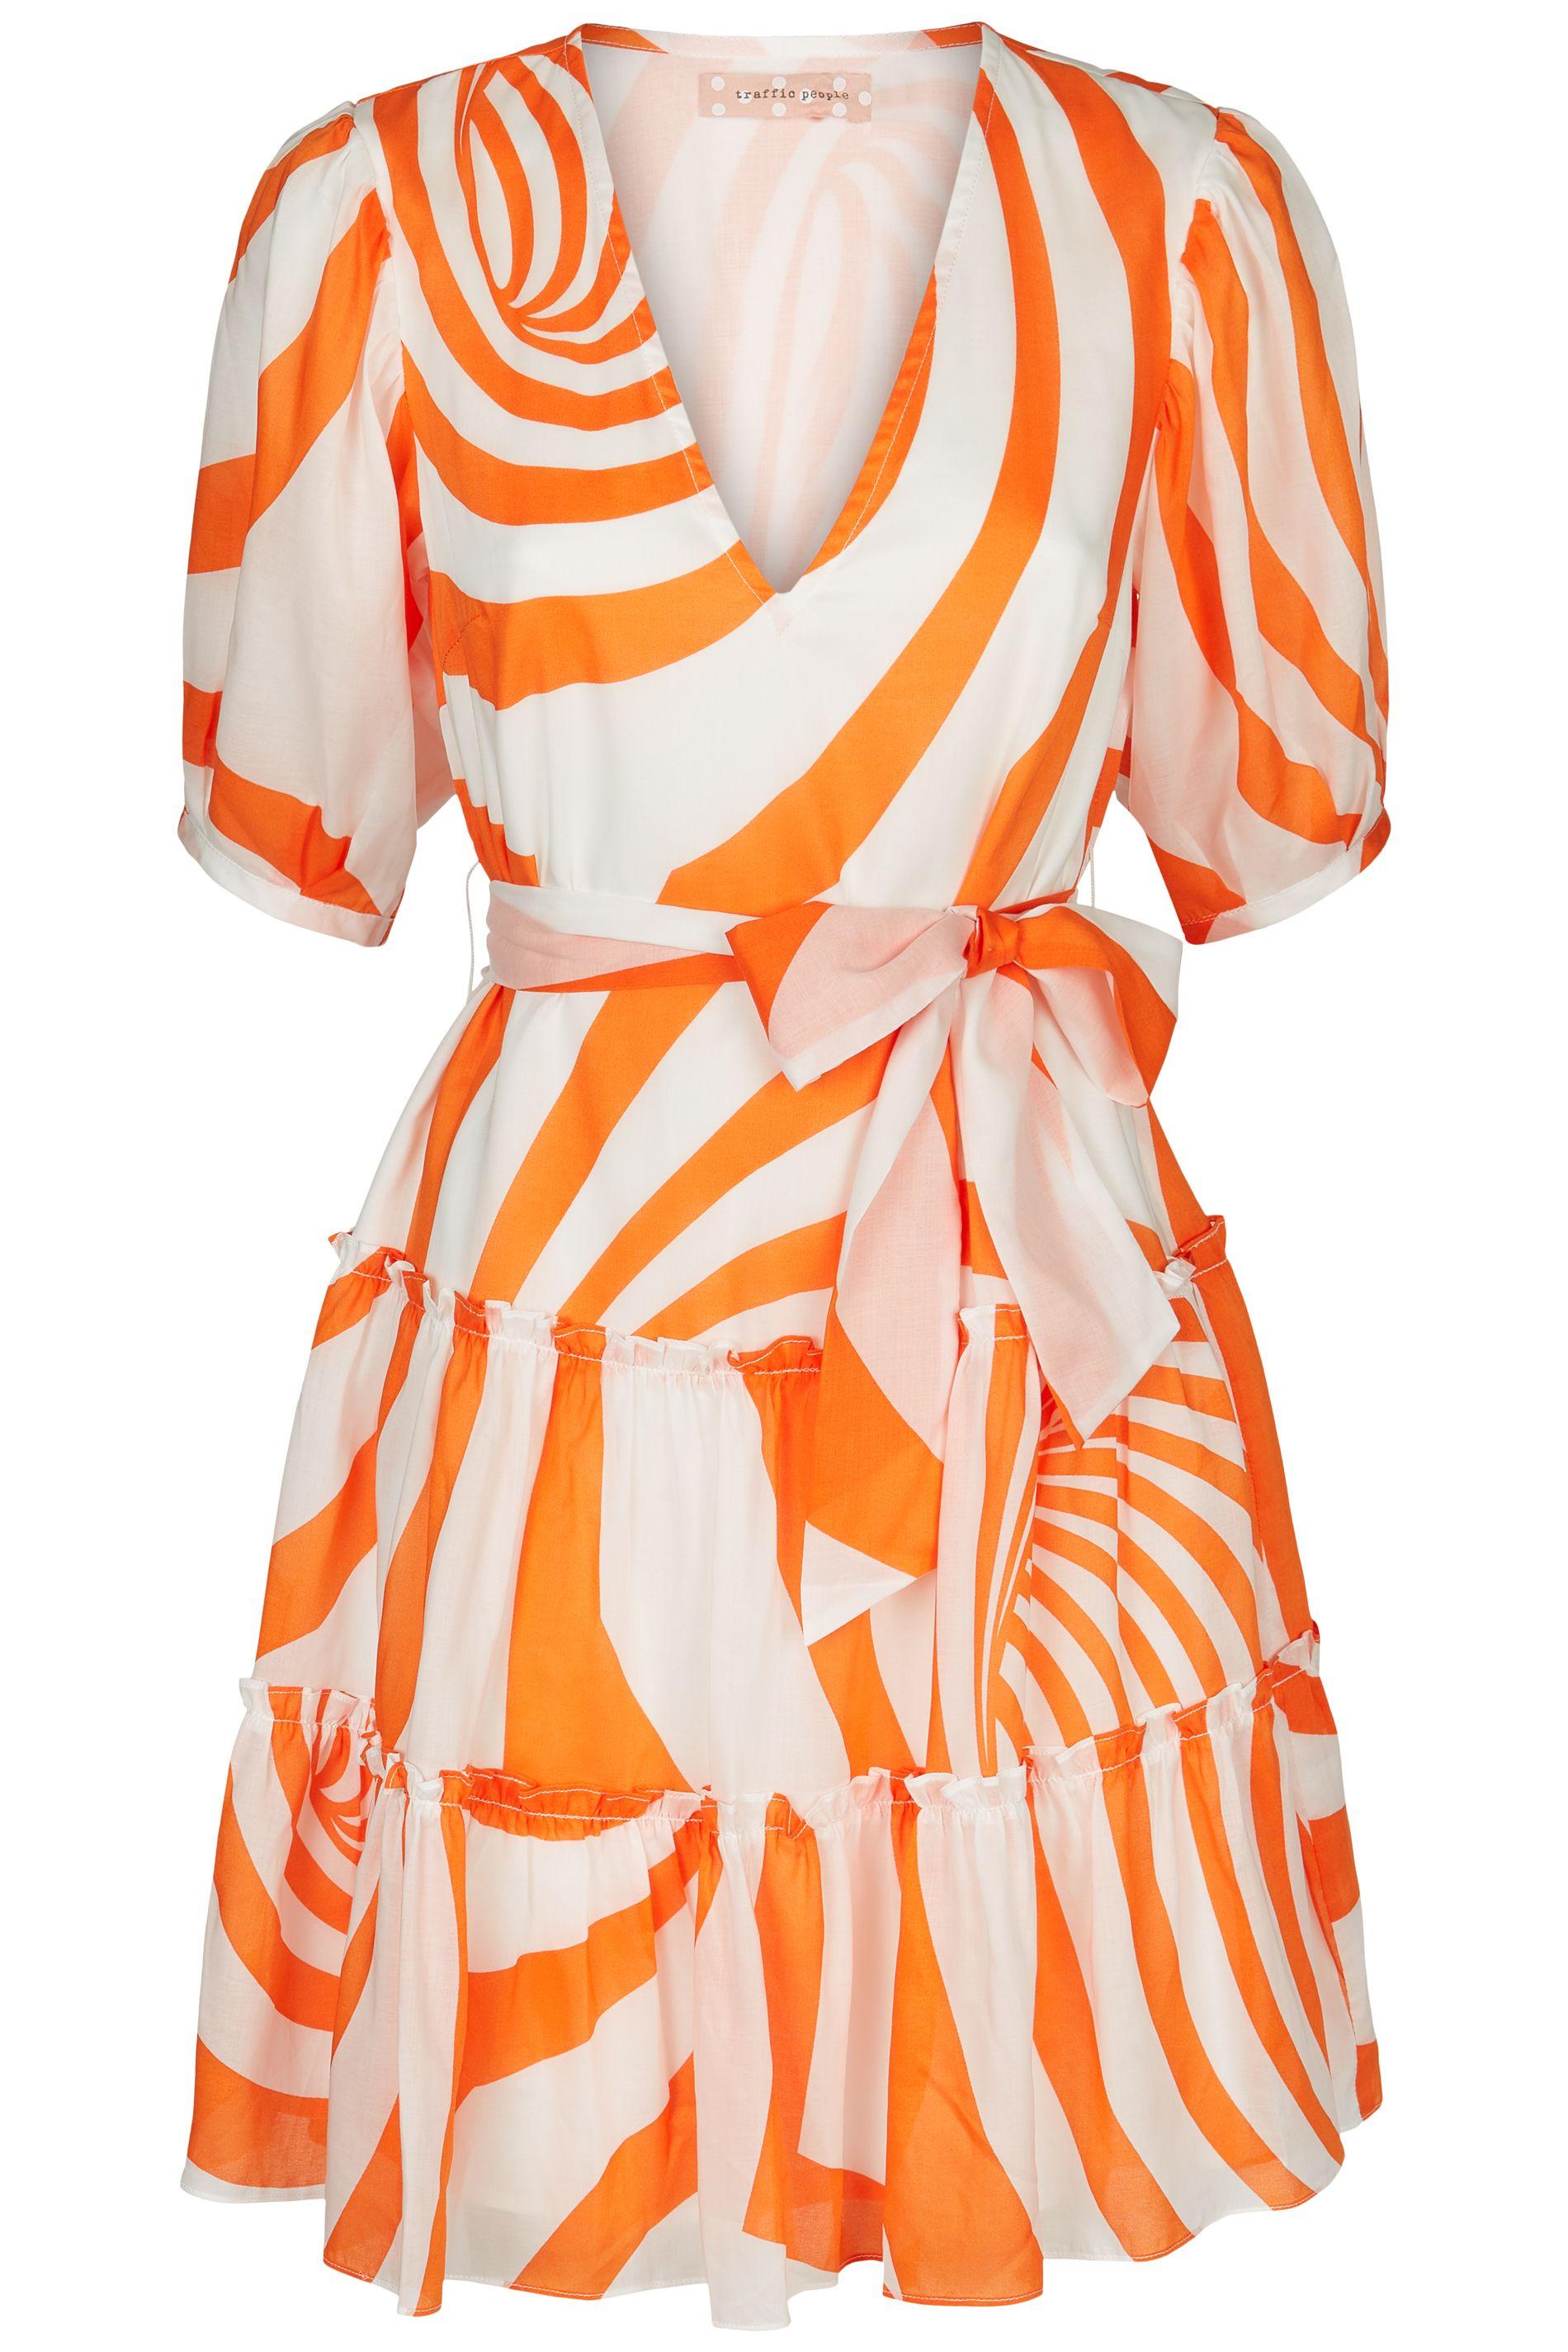 Felicitous Swirl Print Mini Dress in White and Orange